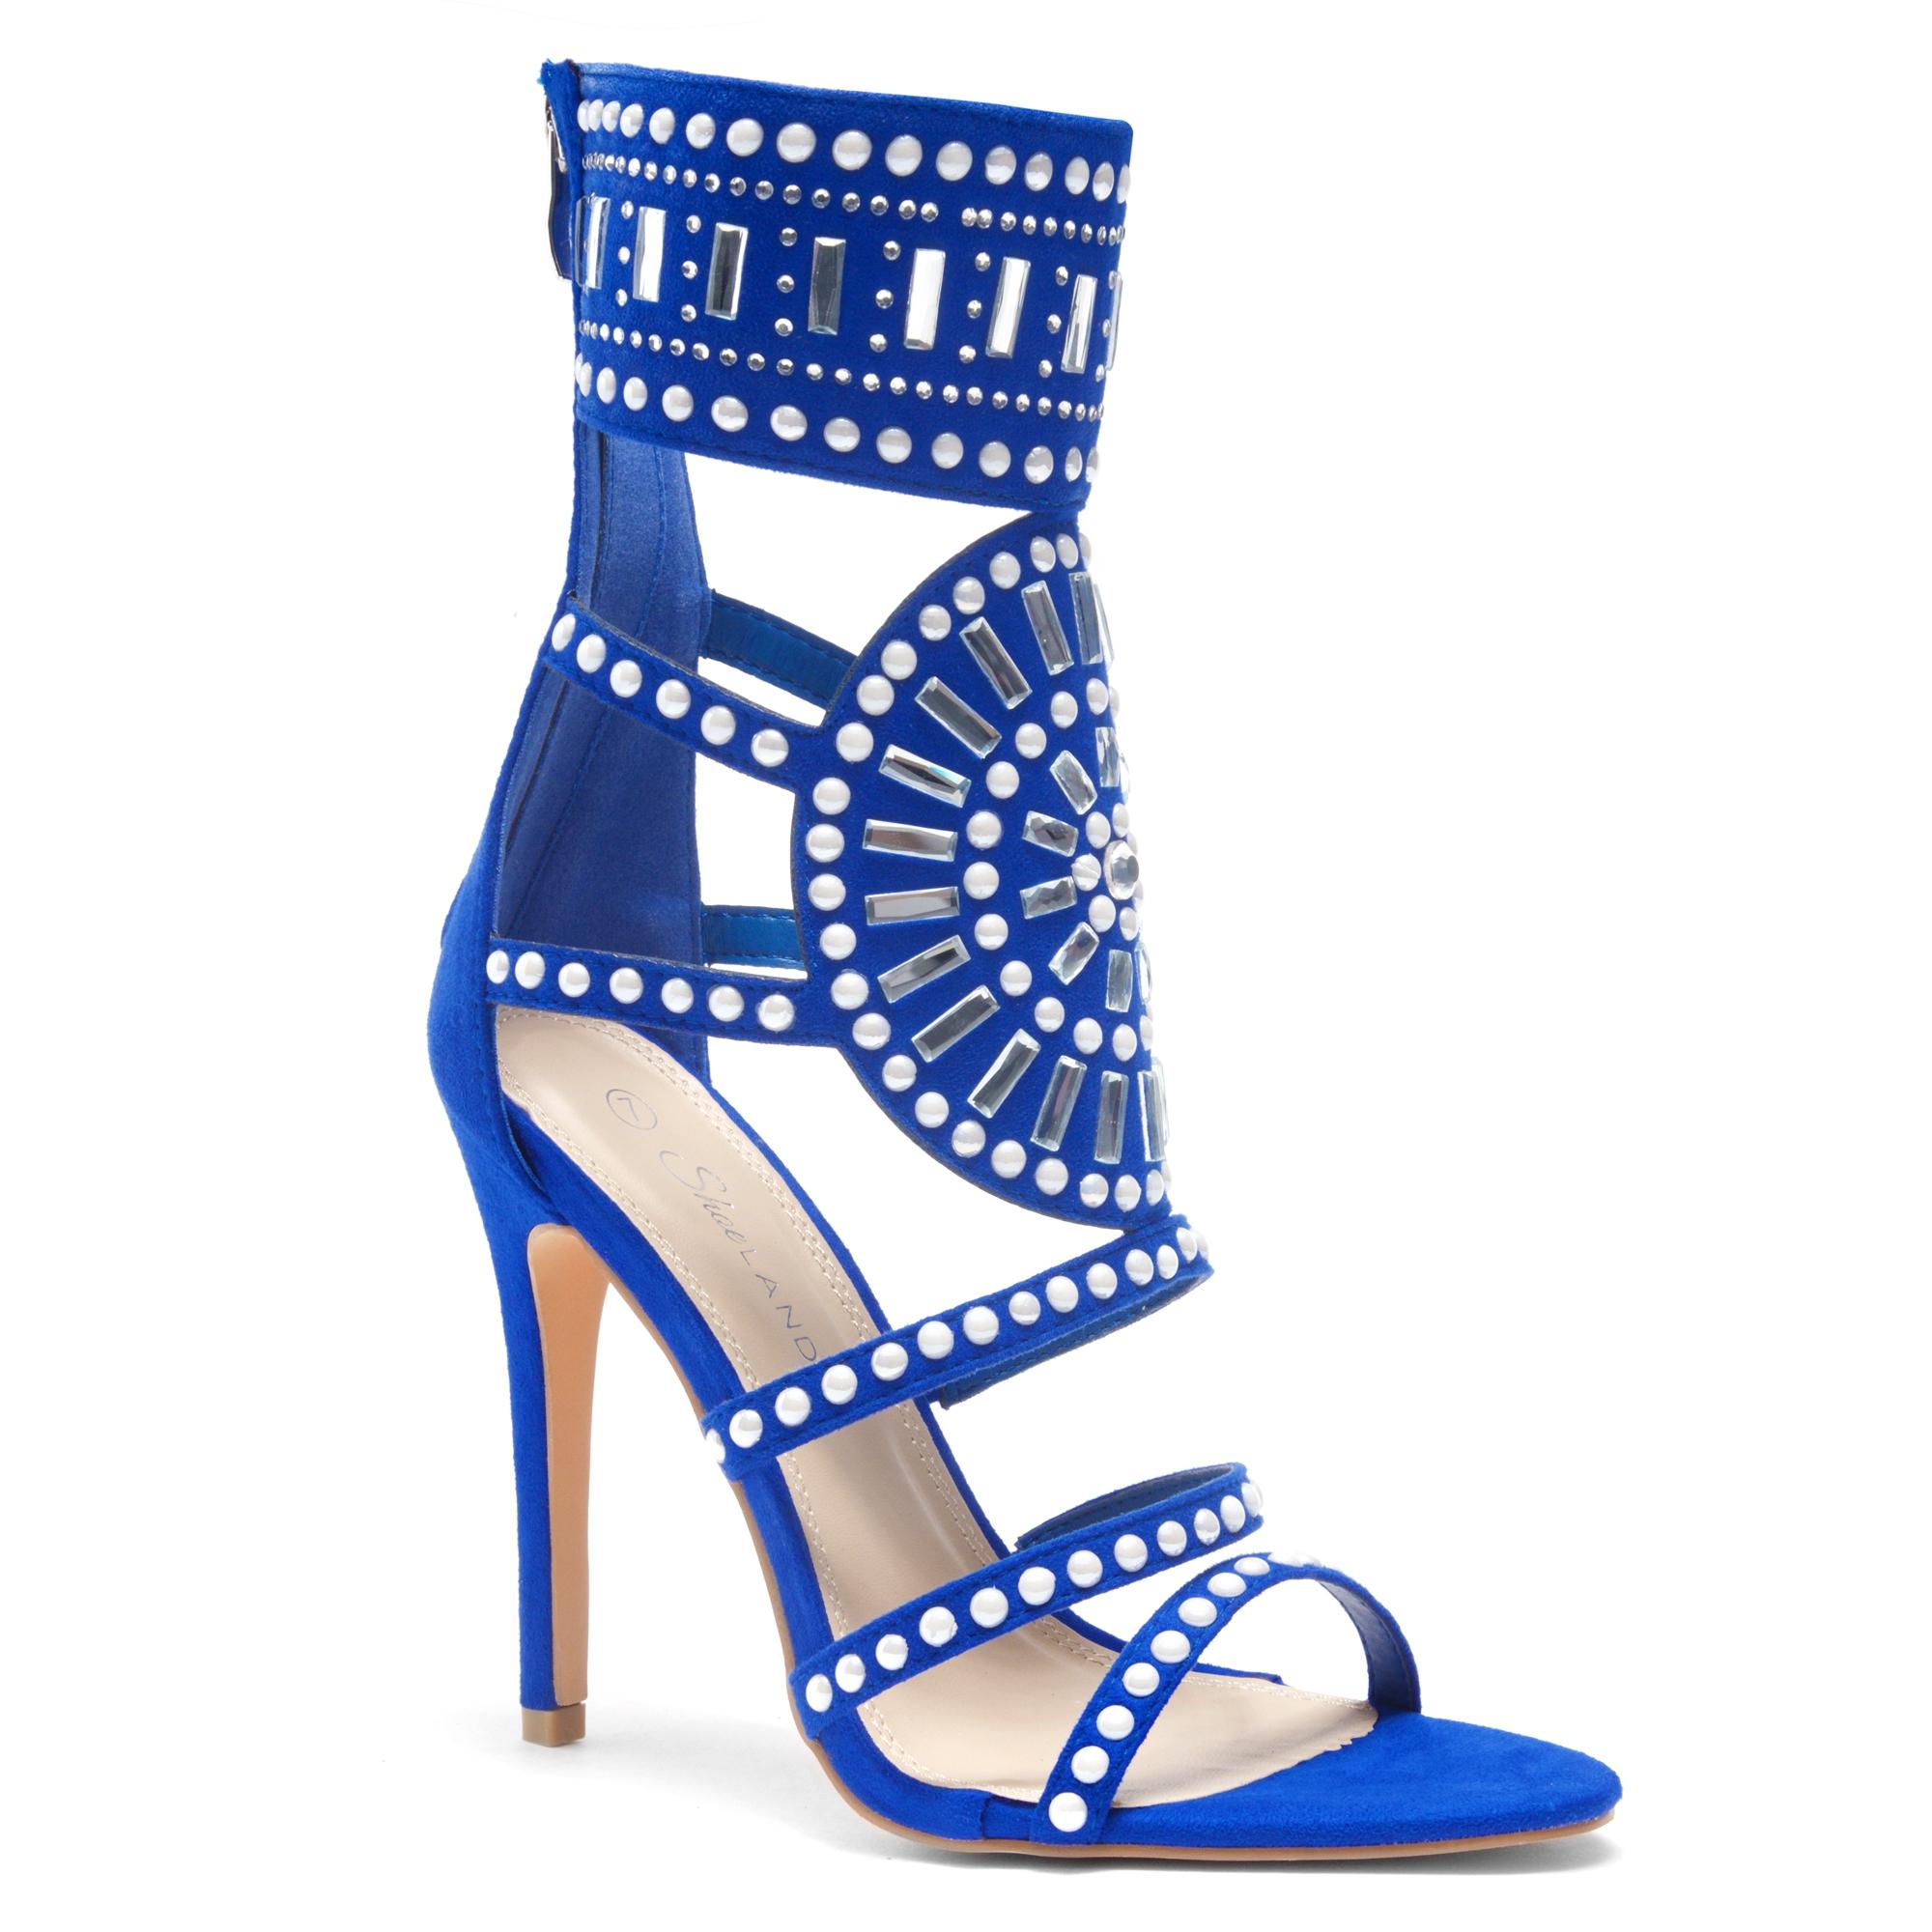 35abccba0b0e HerStyle Fashion Crowd stiletto heel